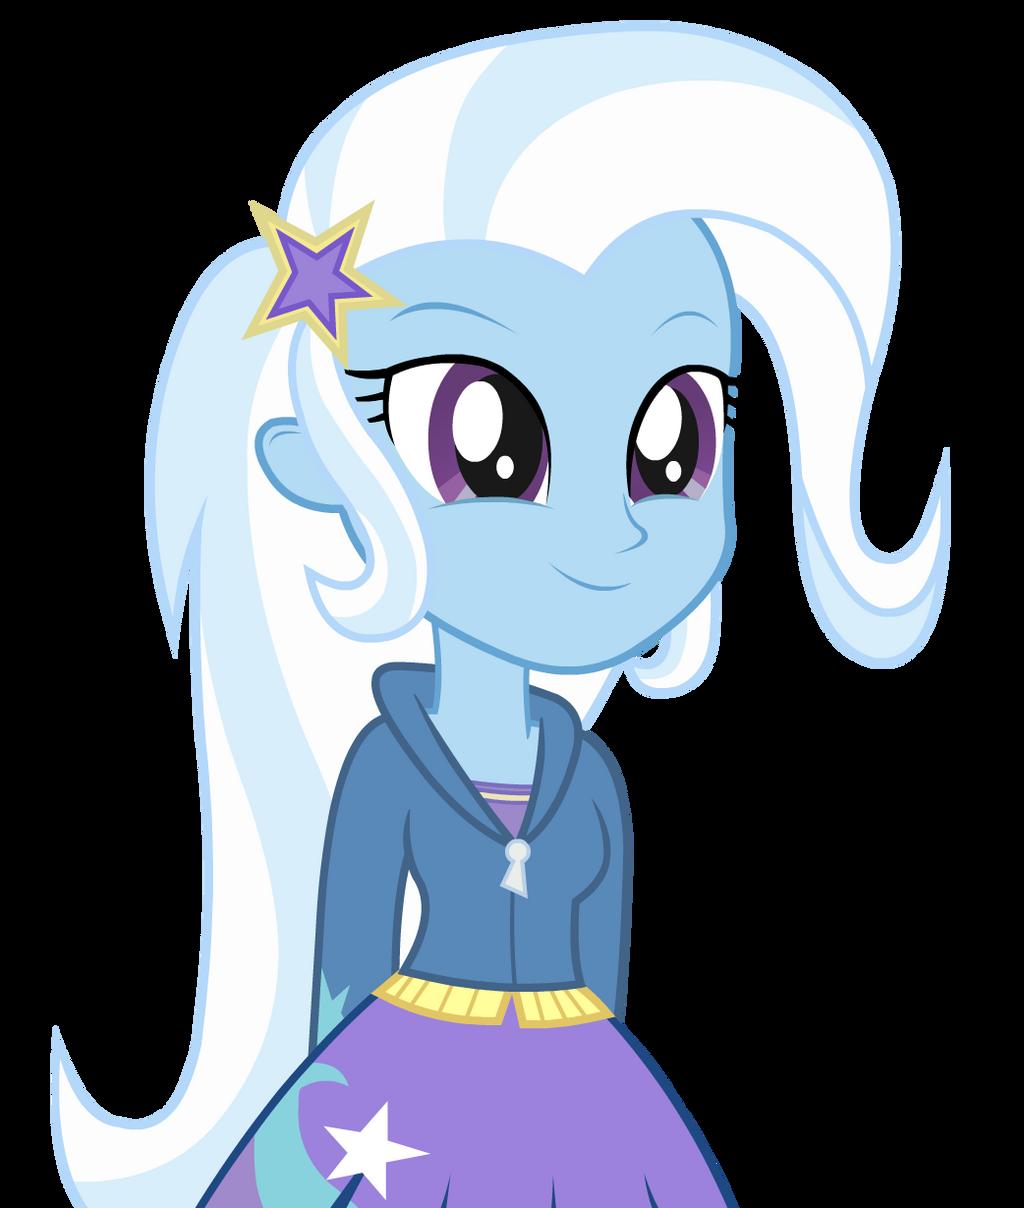 Trixie Lulamoon - Equestria Girl by negasun